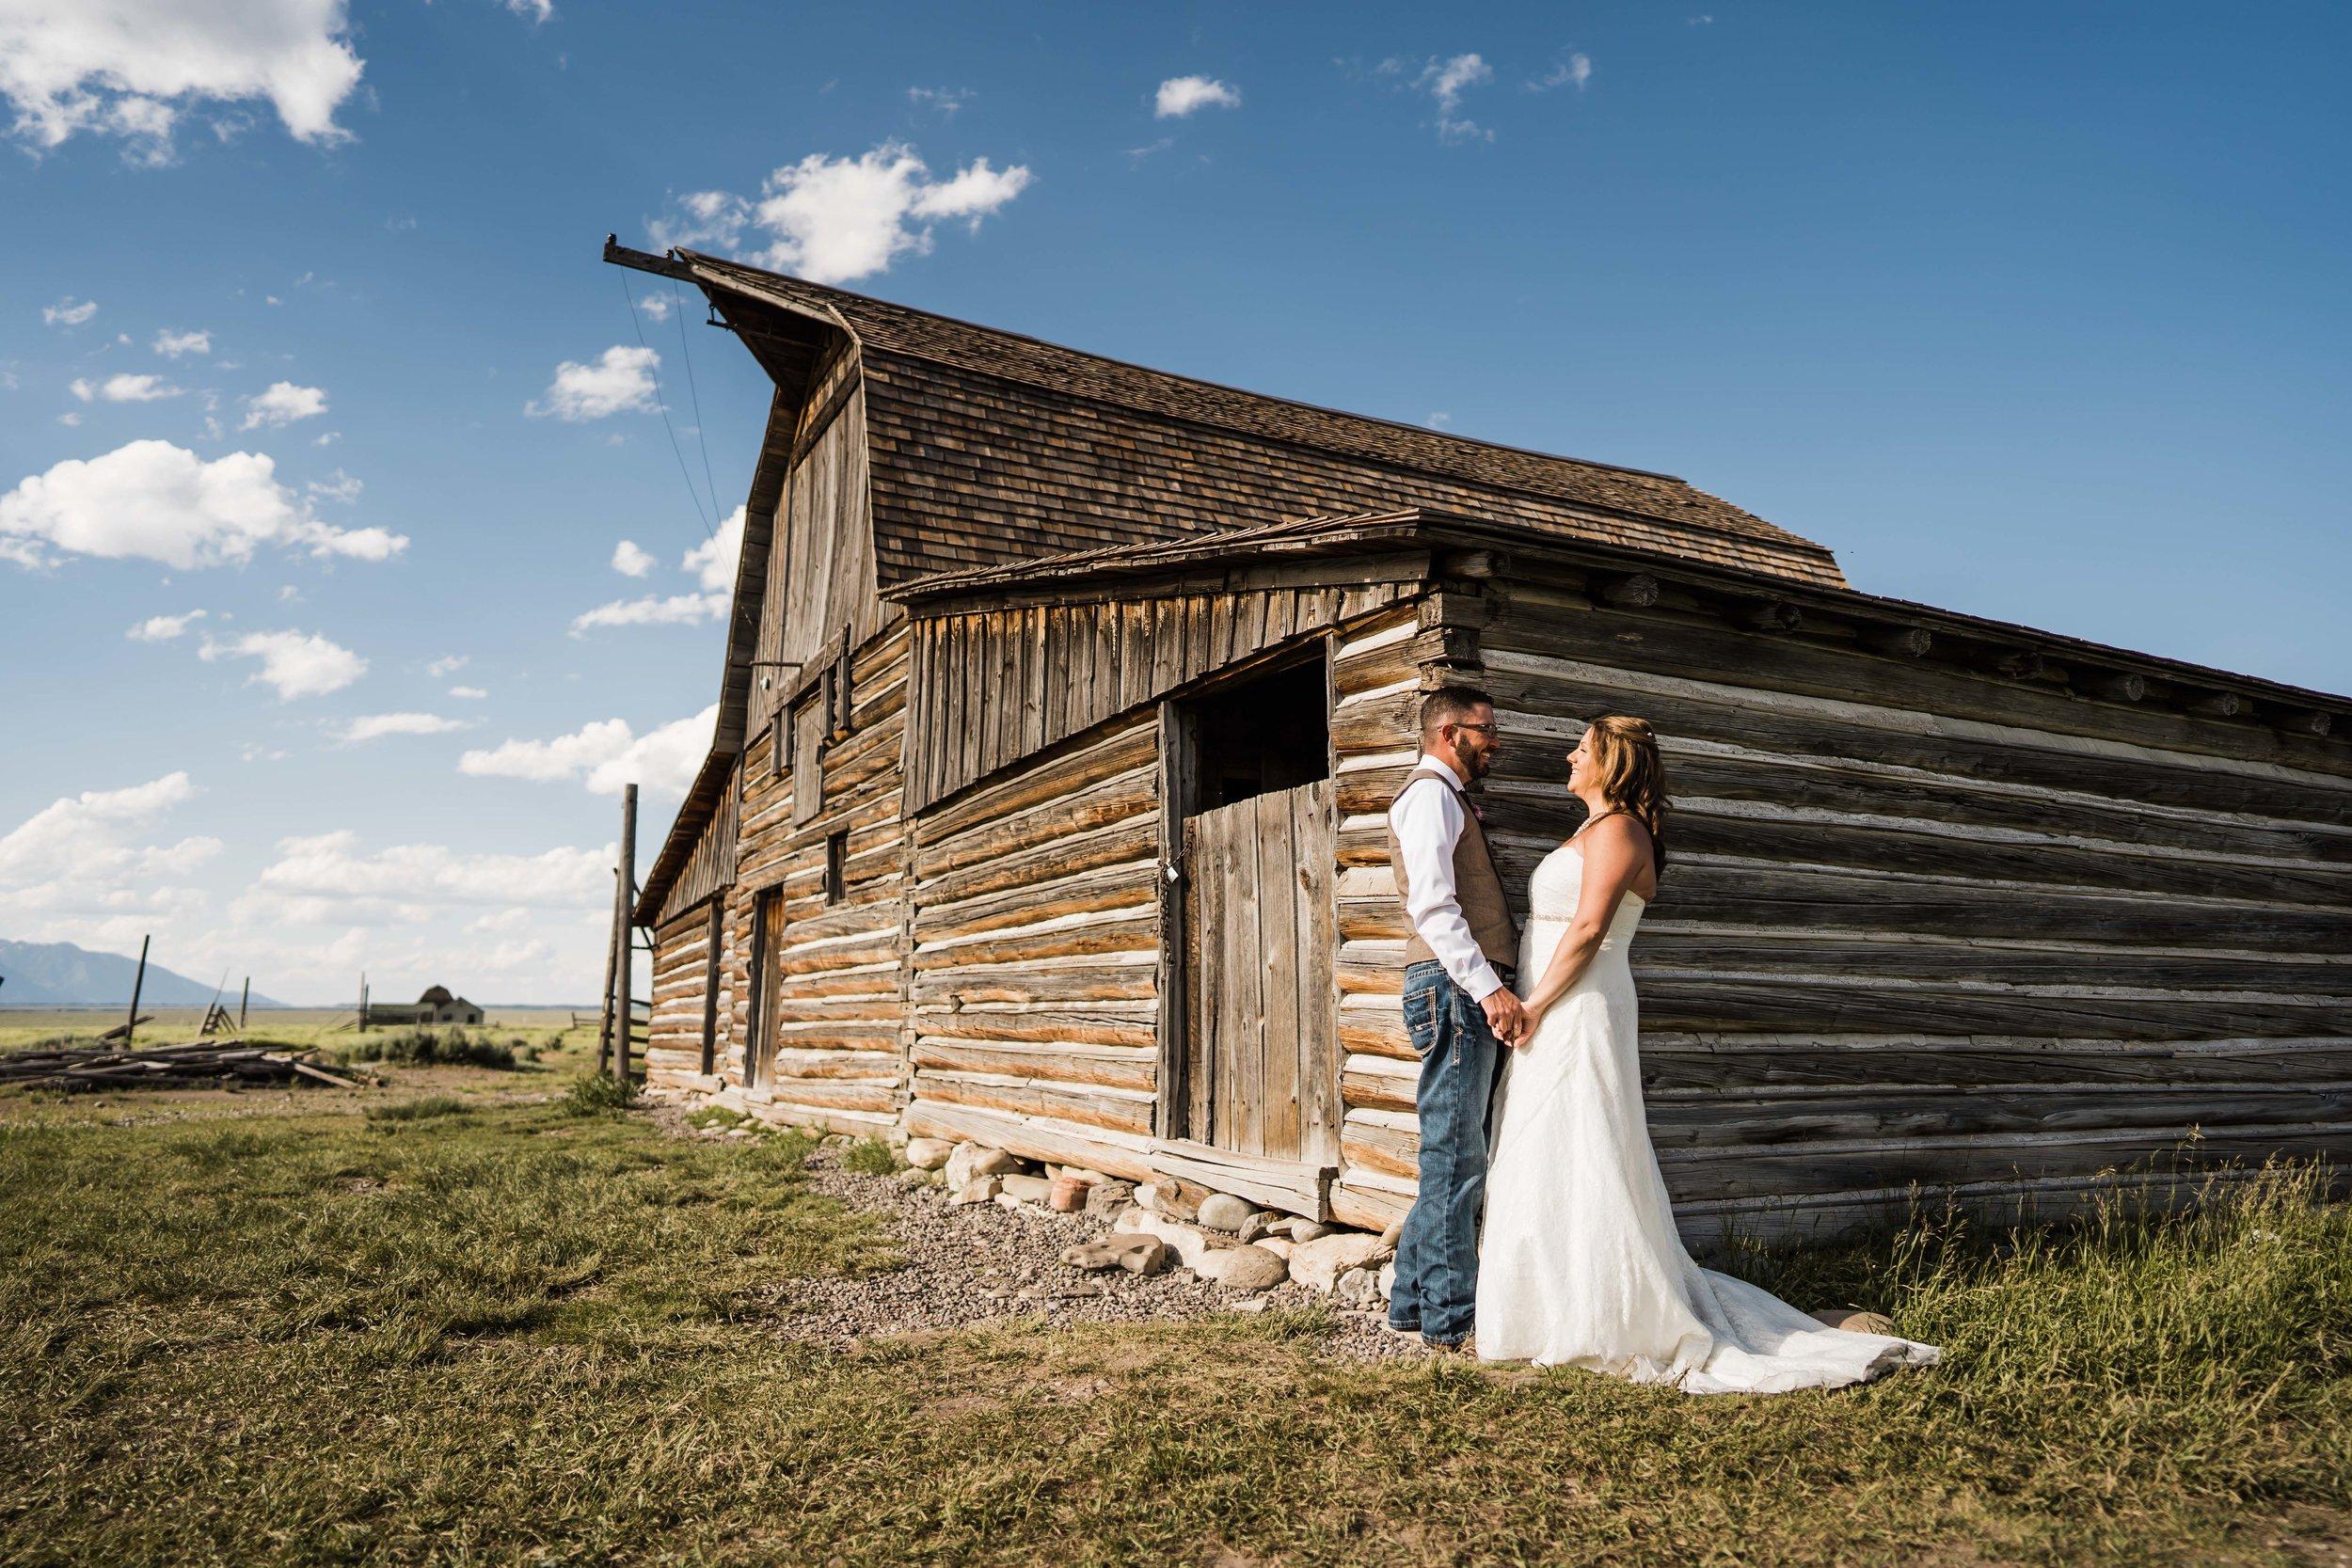 jackson hole adventure wedding photography at schwabachers landing in GTNP -DSD01398.jpg